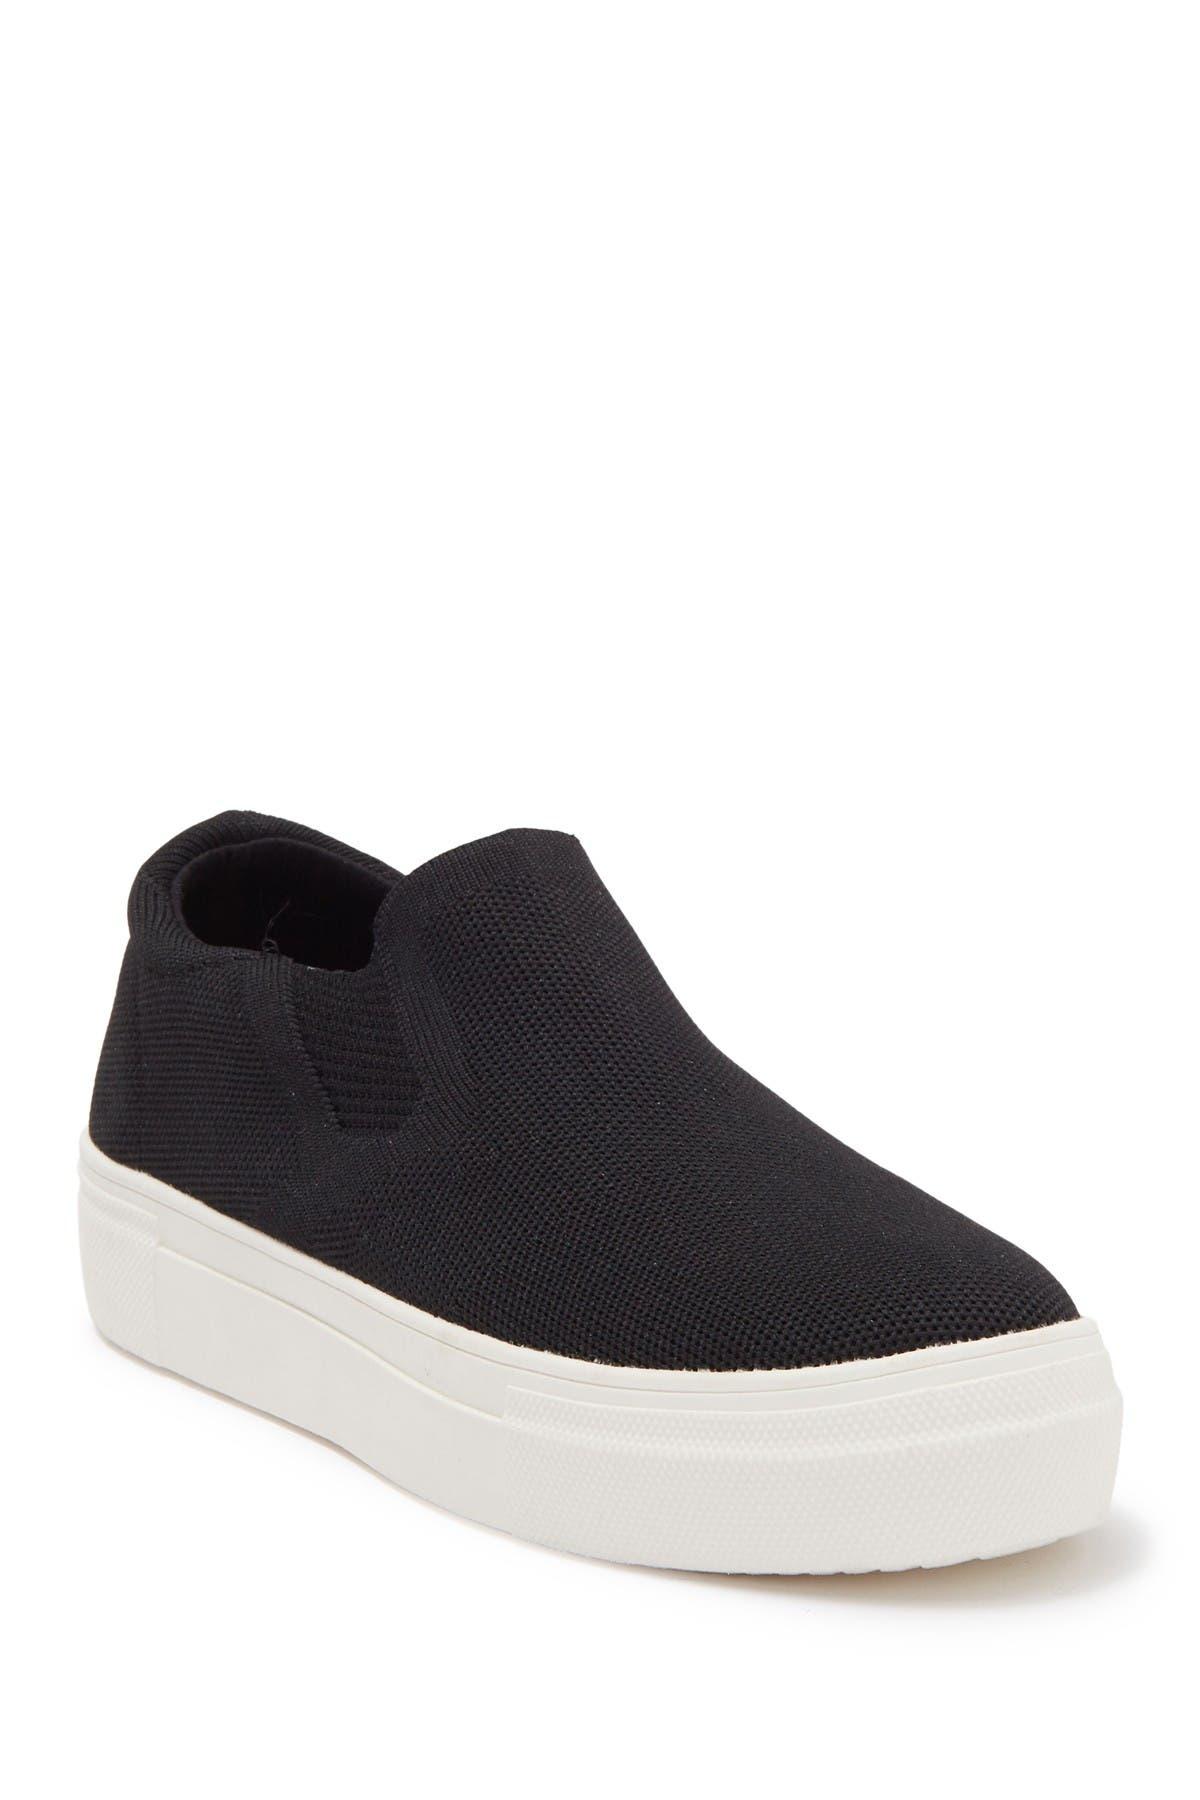 Image of MIA Haley Slip-On Sneaker